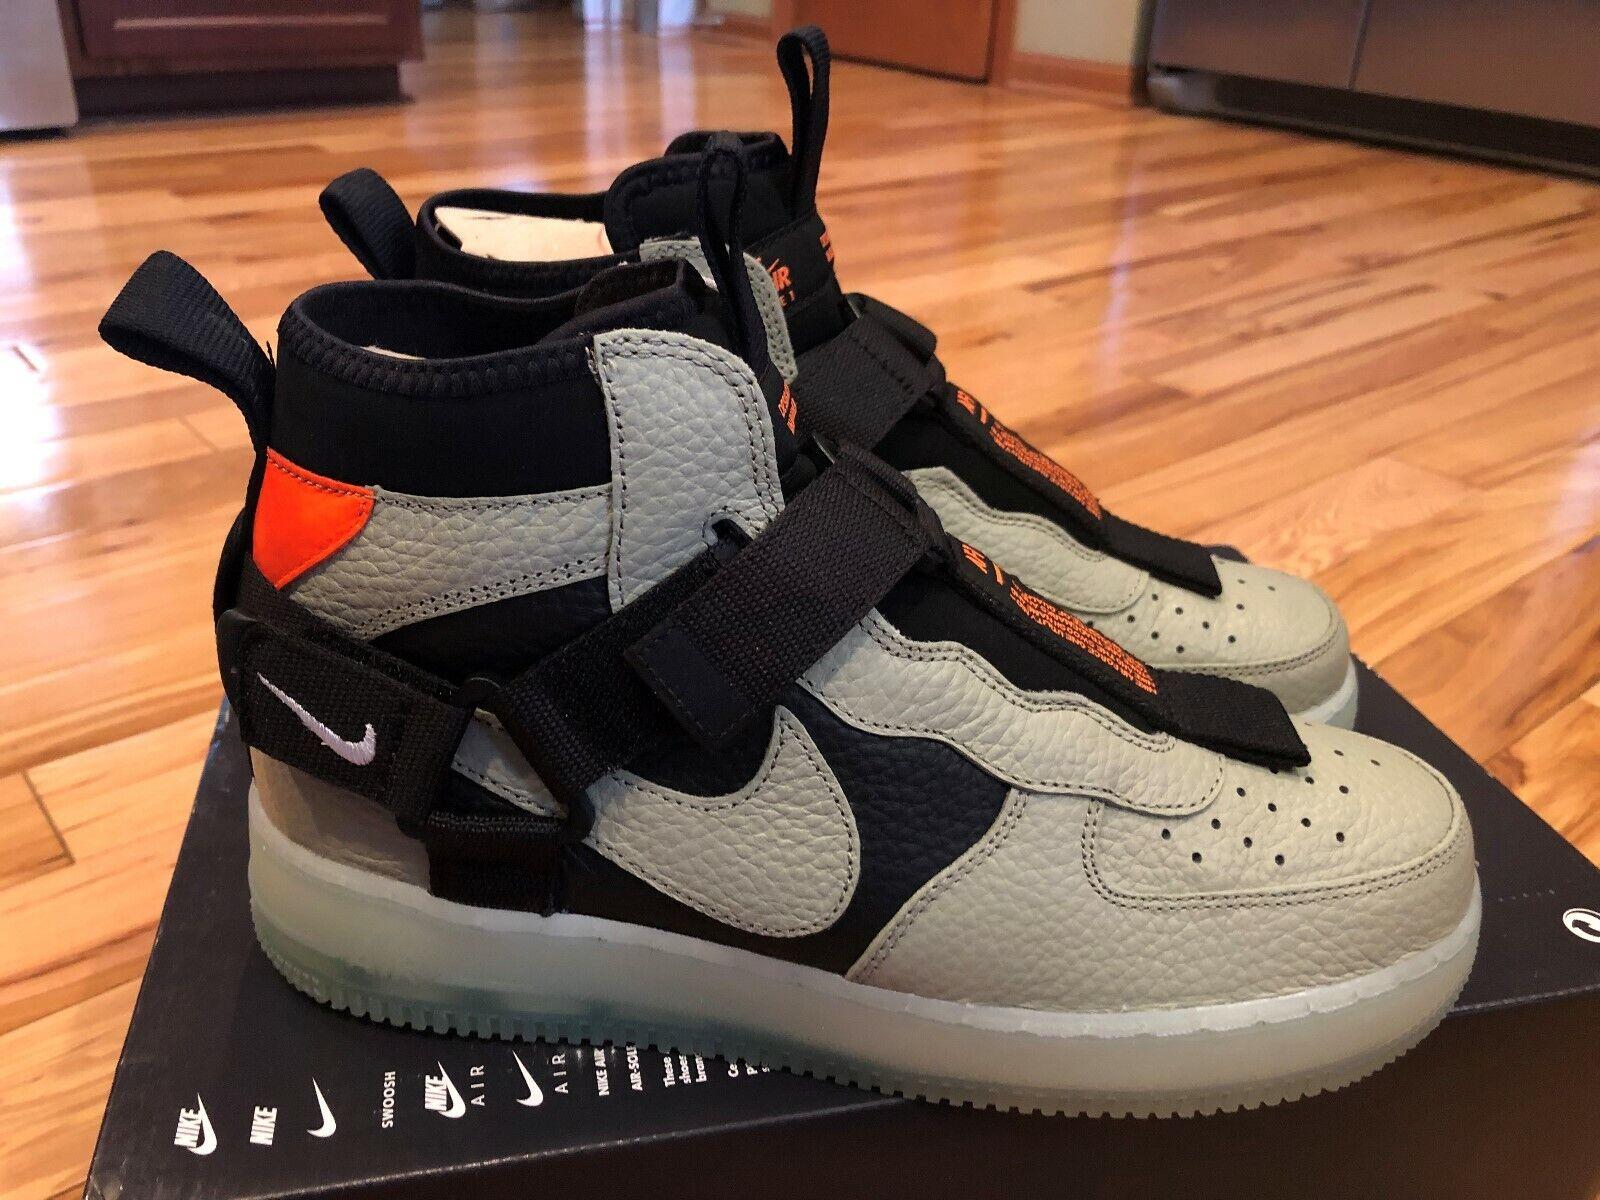 Nike Air Force 1 Utility Mid Spruce Fog nero  AQ9758 300 Men's Dimensione 7.5  marchi di moda